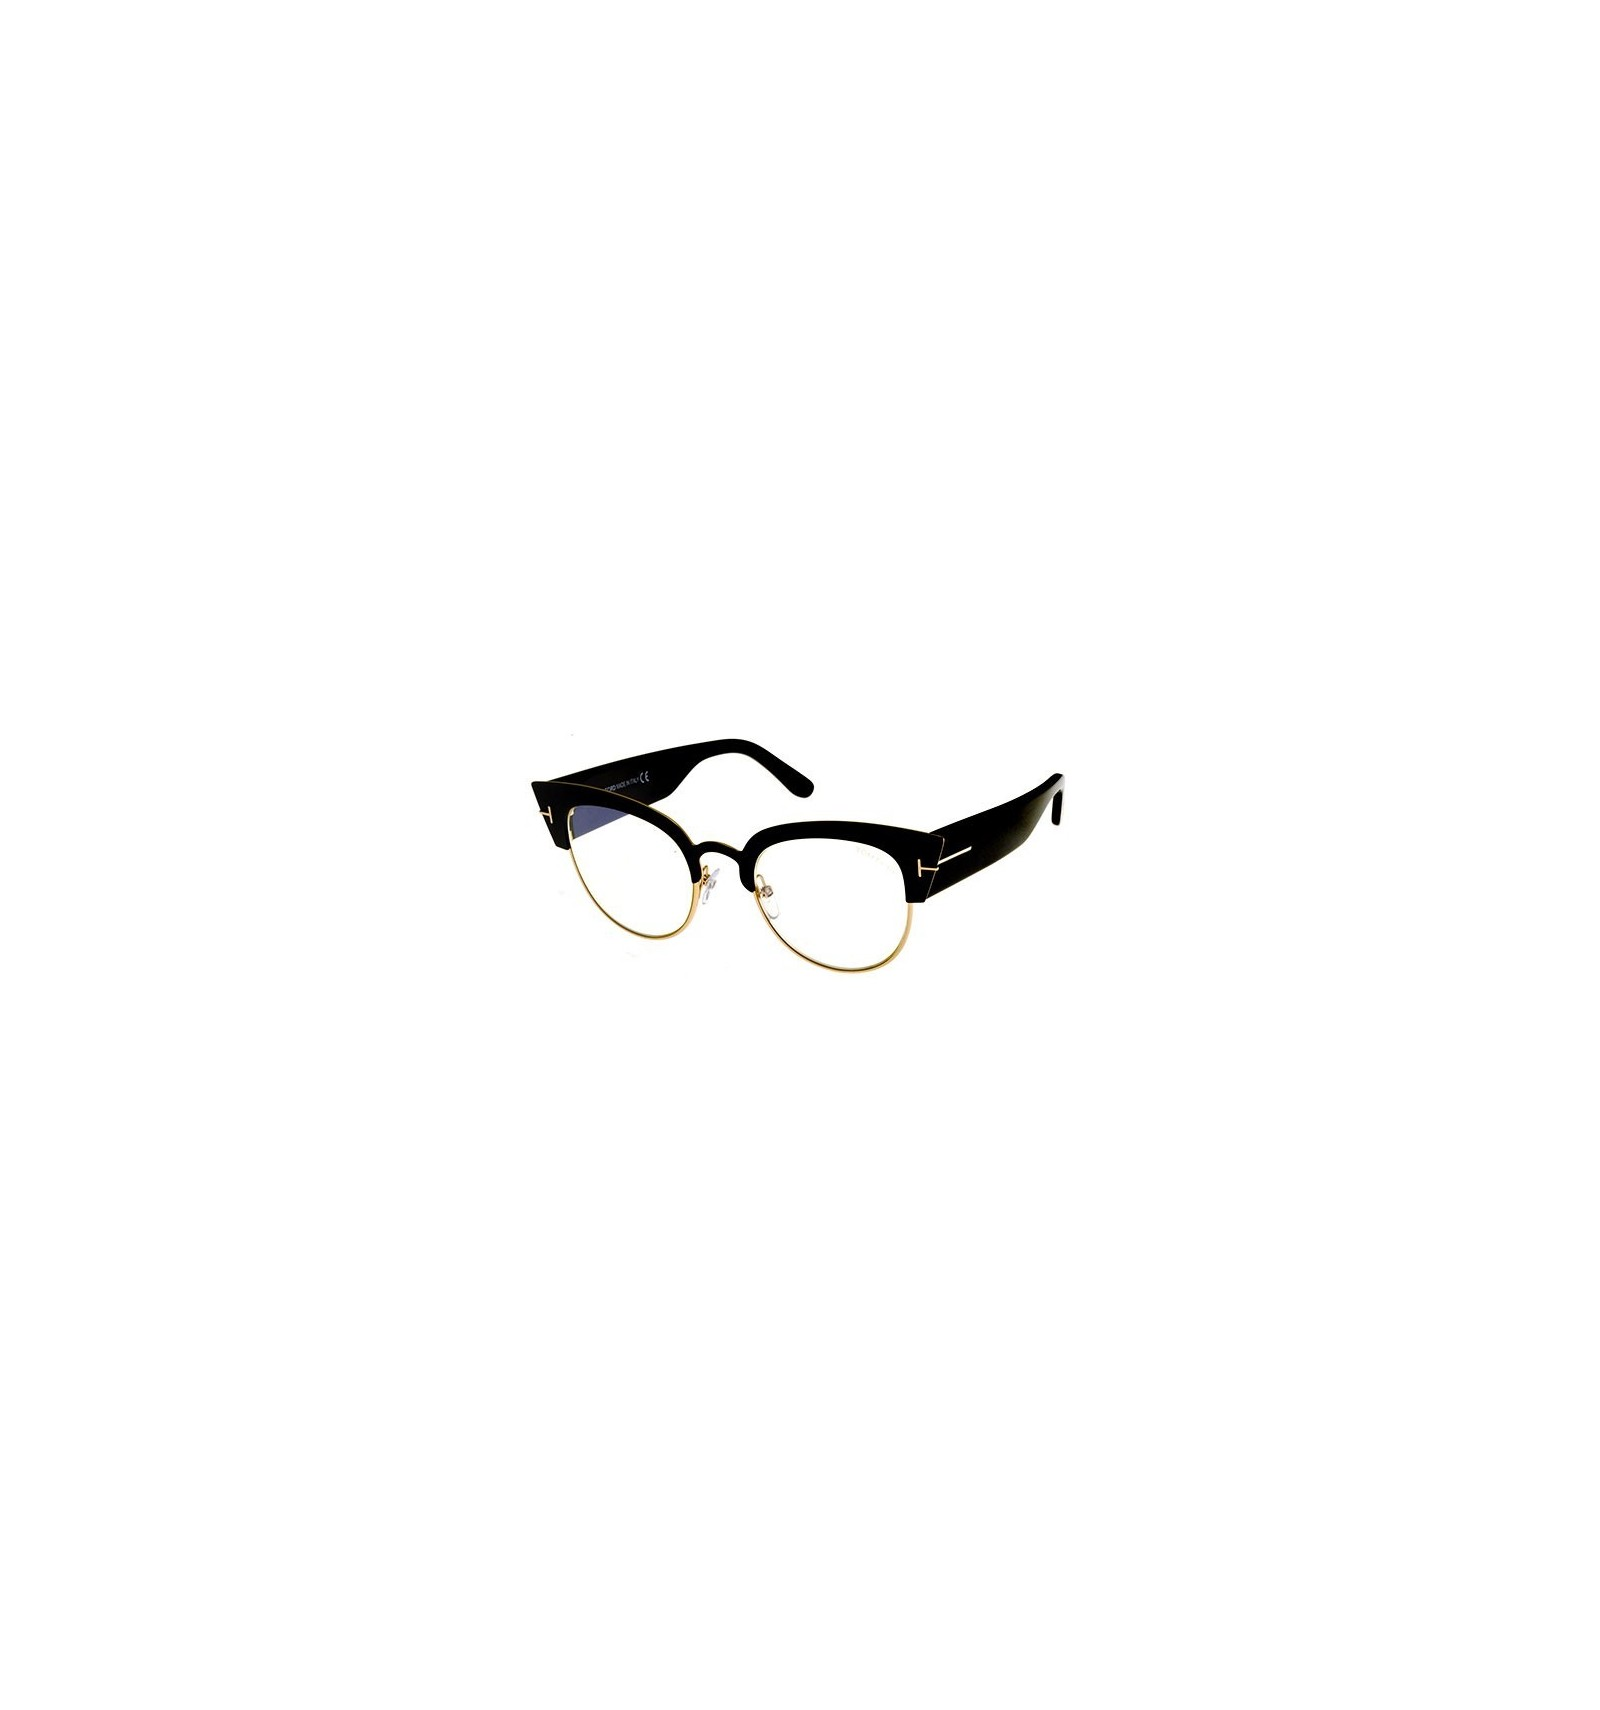 Nuevo 2018 Gafas de Sol Tom Ford FT0607 ALEXANDRA Mate Black - Blue Look  Lenses (005 A b357f9c6e5bf